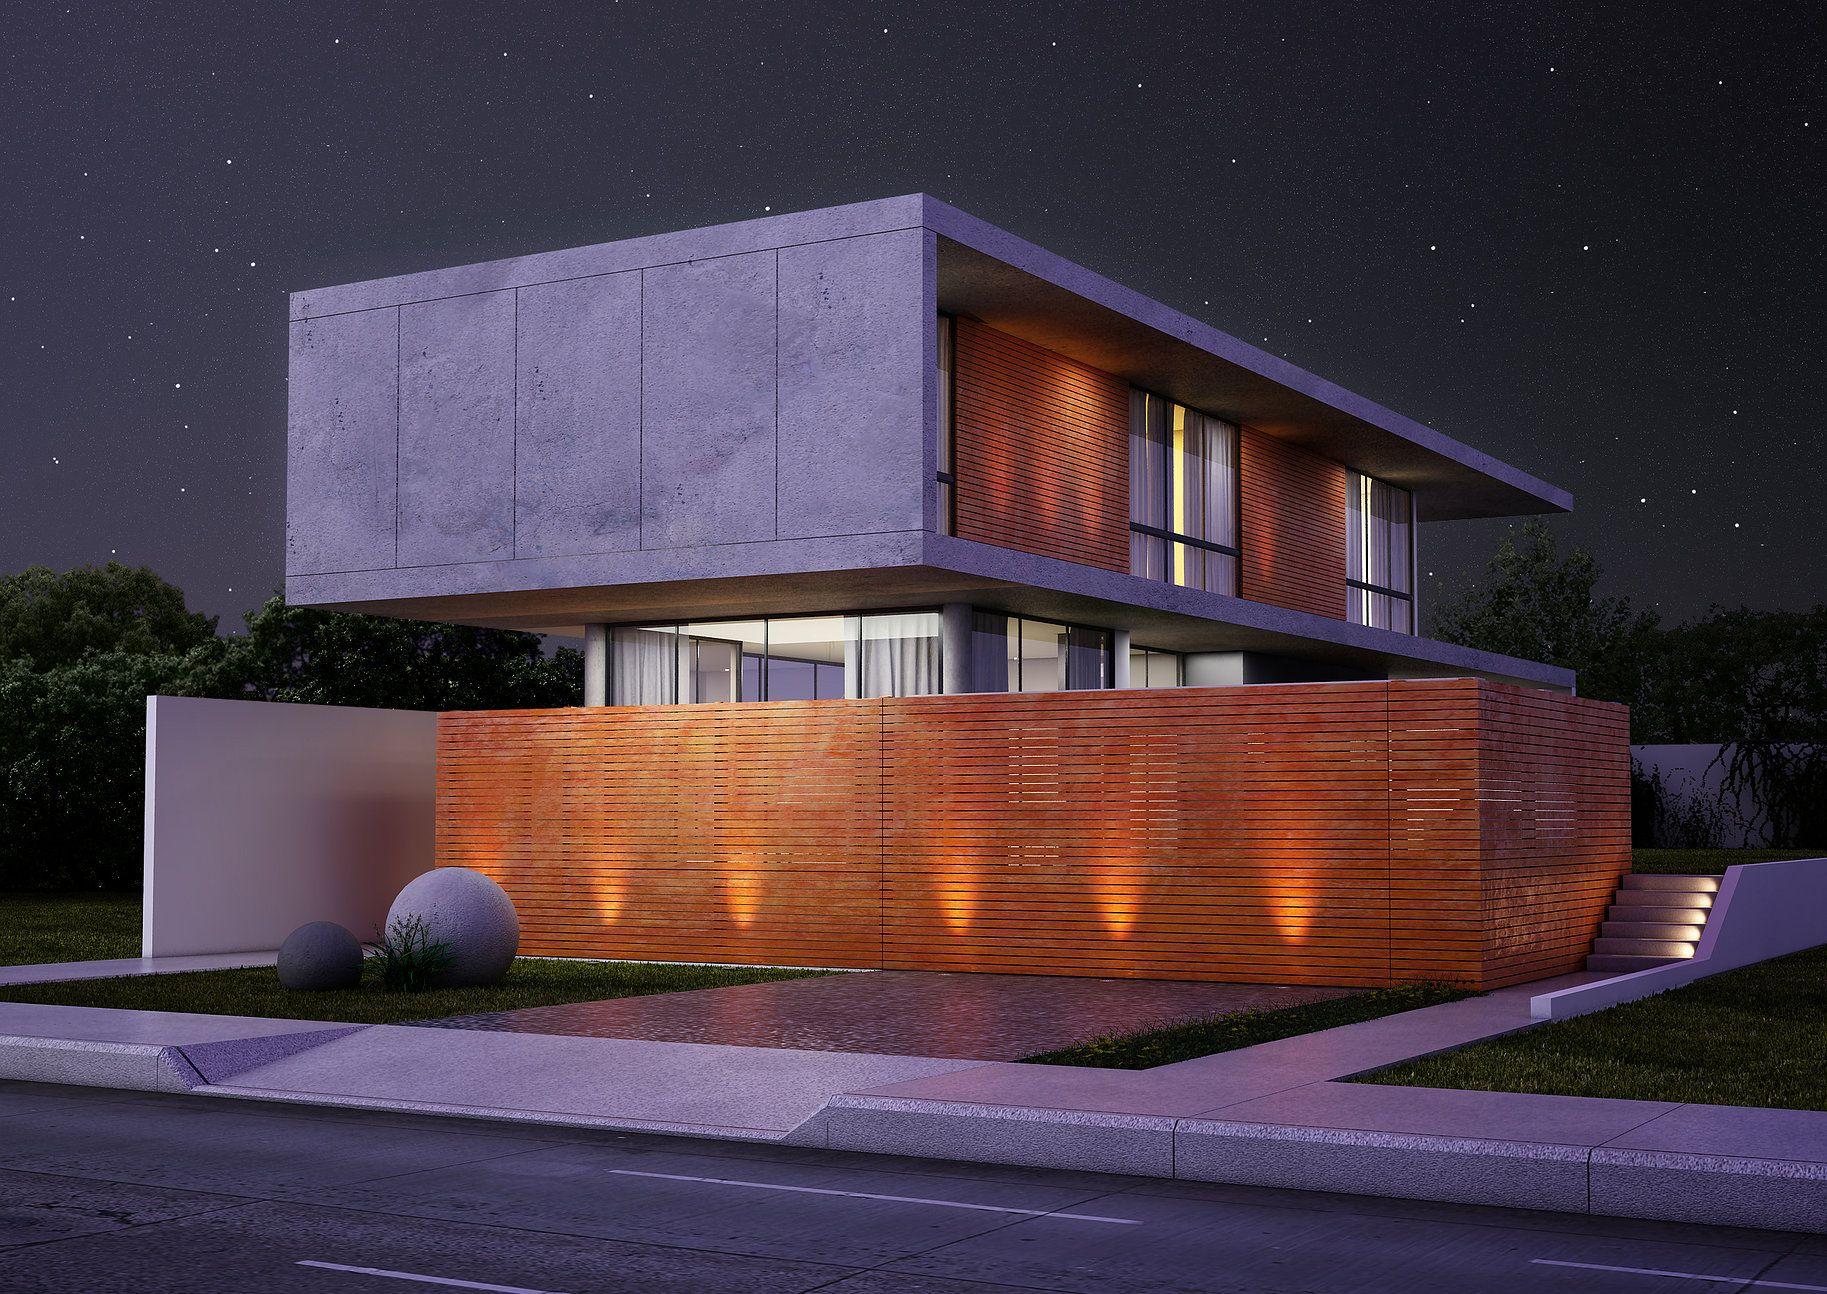 house rn vipe arquitetura modern homes vitor pessoa architect